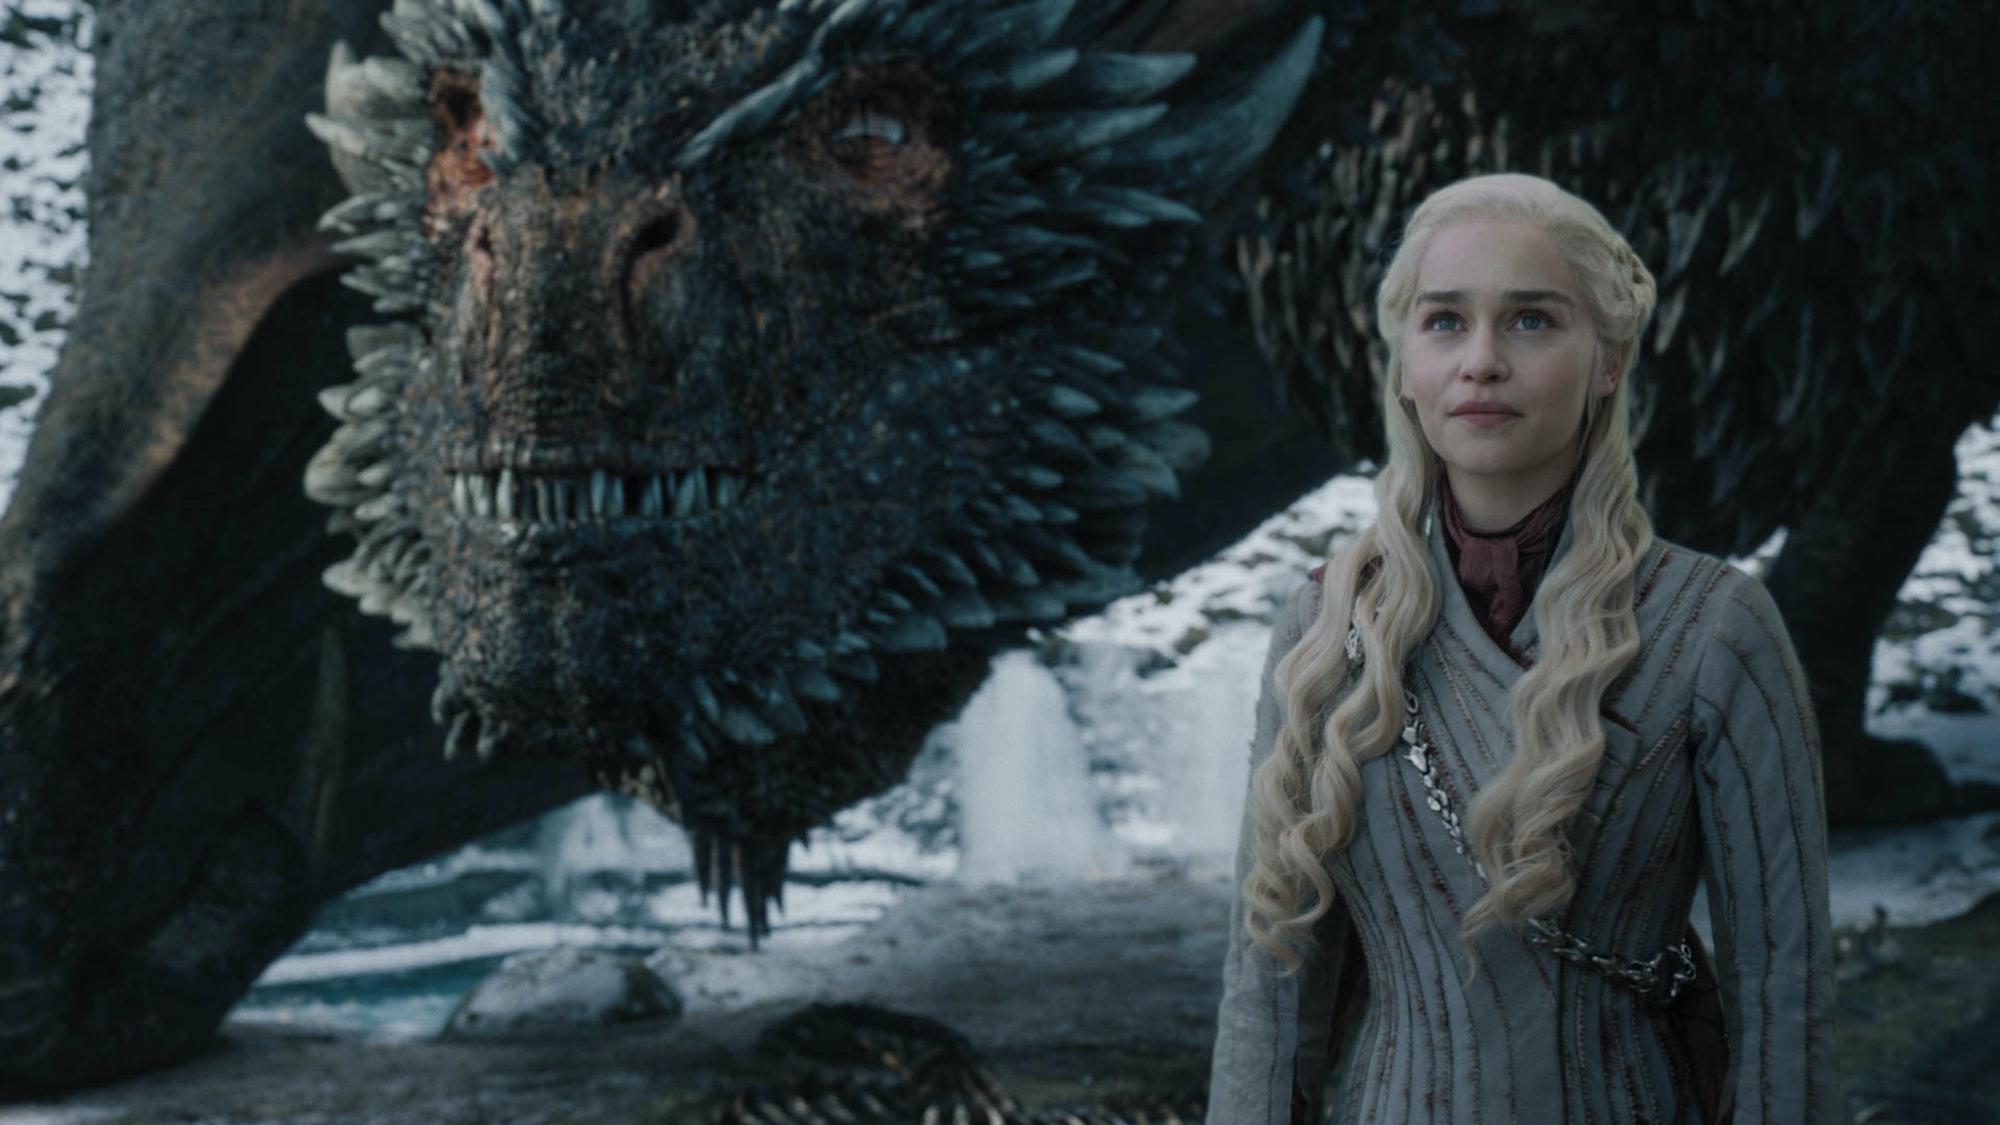 Will Jon Snow turn againstDaenerys Targaryen in Episode 4?